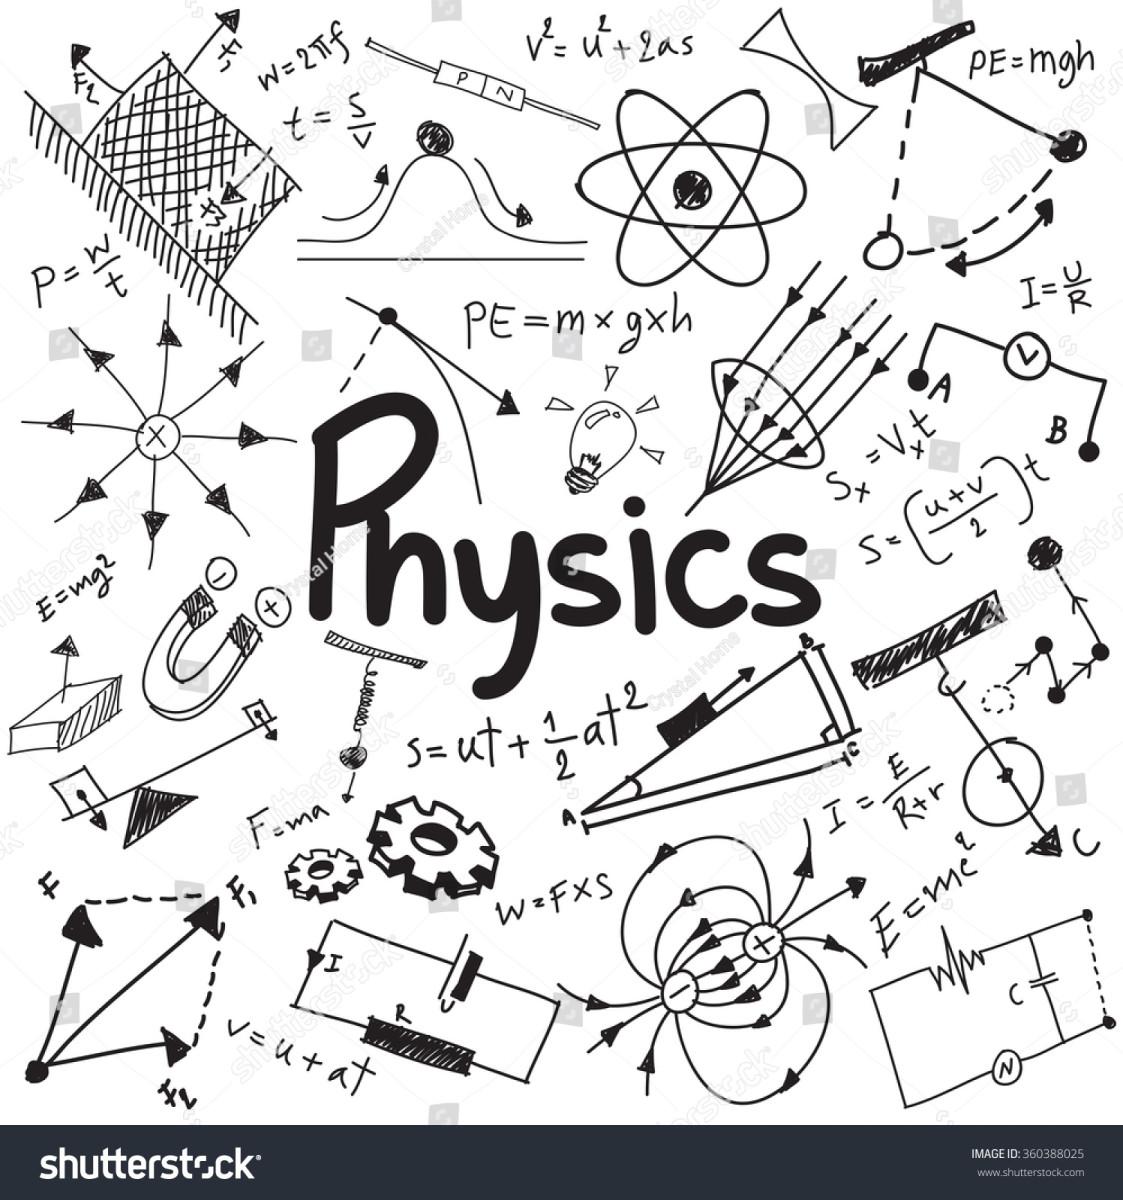 Basic Physics lesson-6 : Volume and density